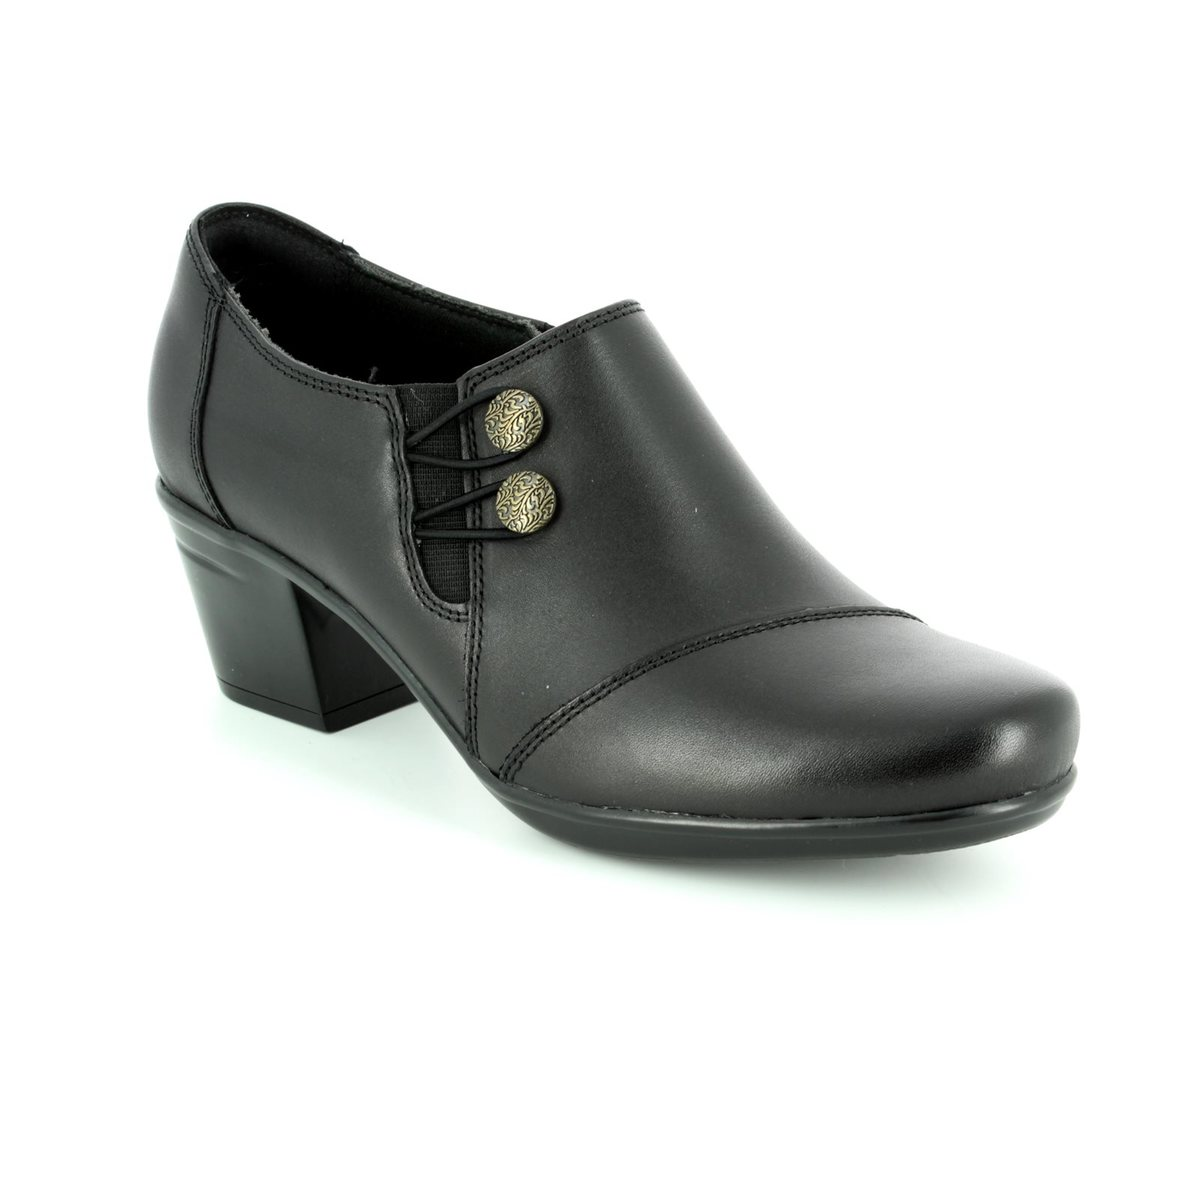 Clarks Shoe-boots - Black - 2844 24D EMSLIE WARREN 4982f9ab440